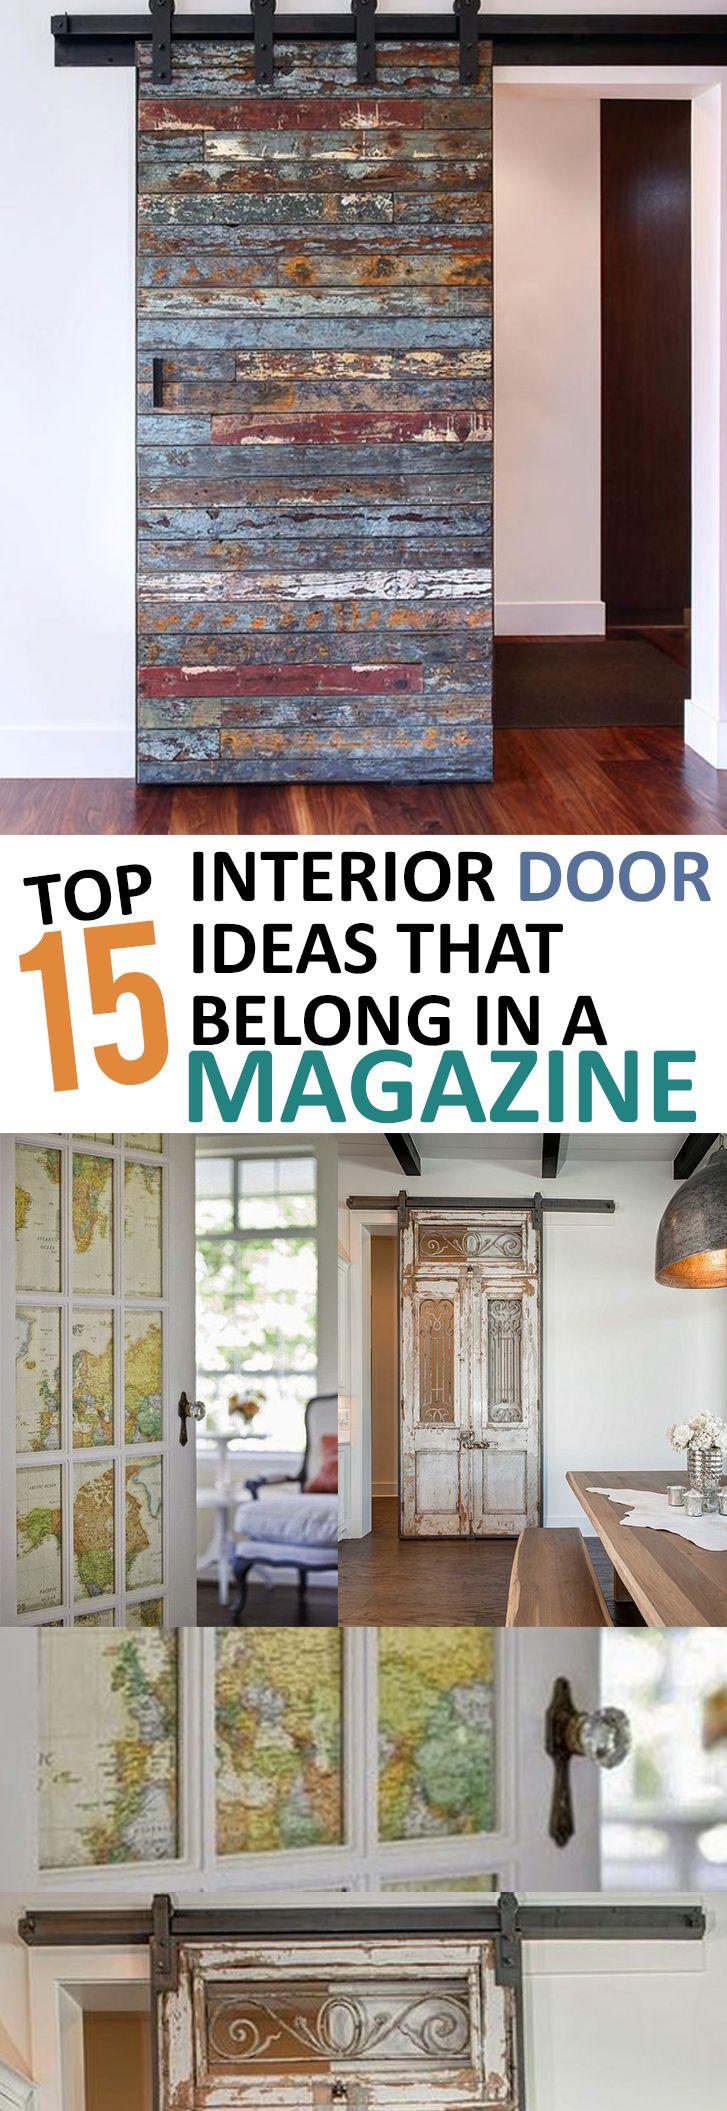 interior design interior design hacks door projects diy projects popular pin